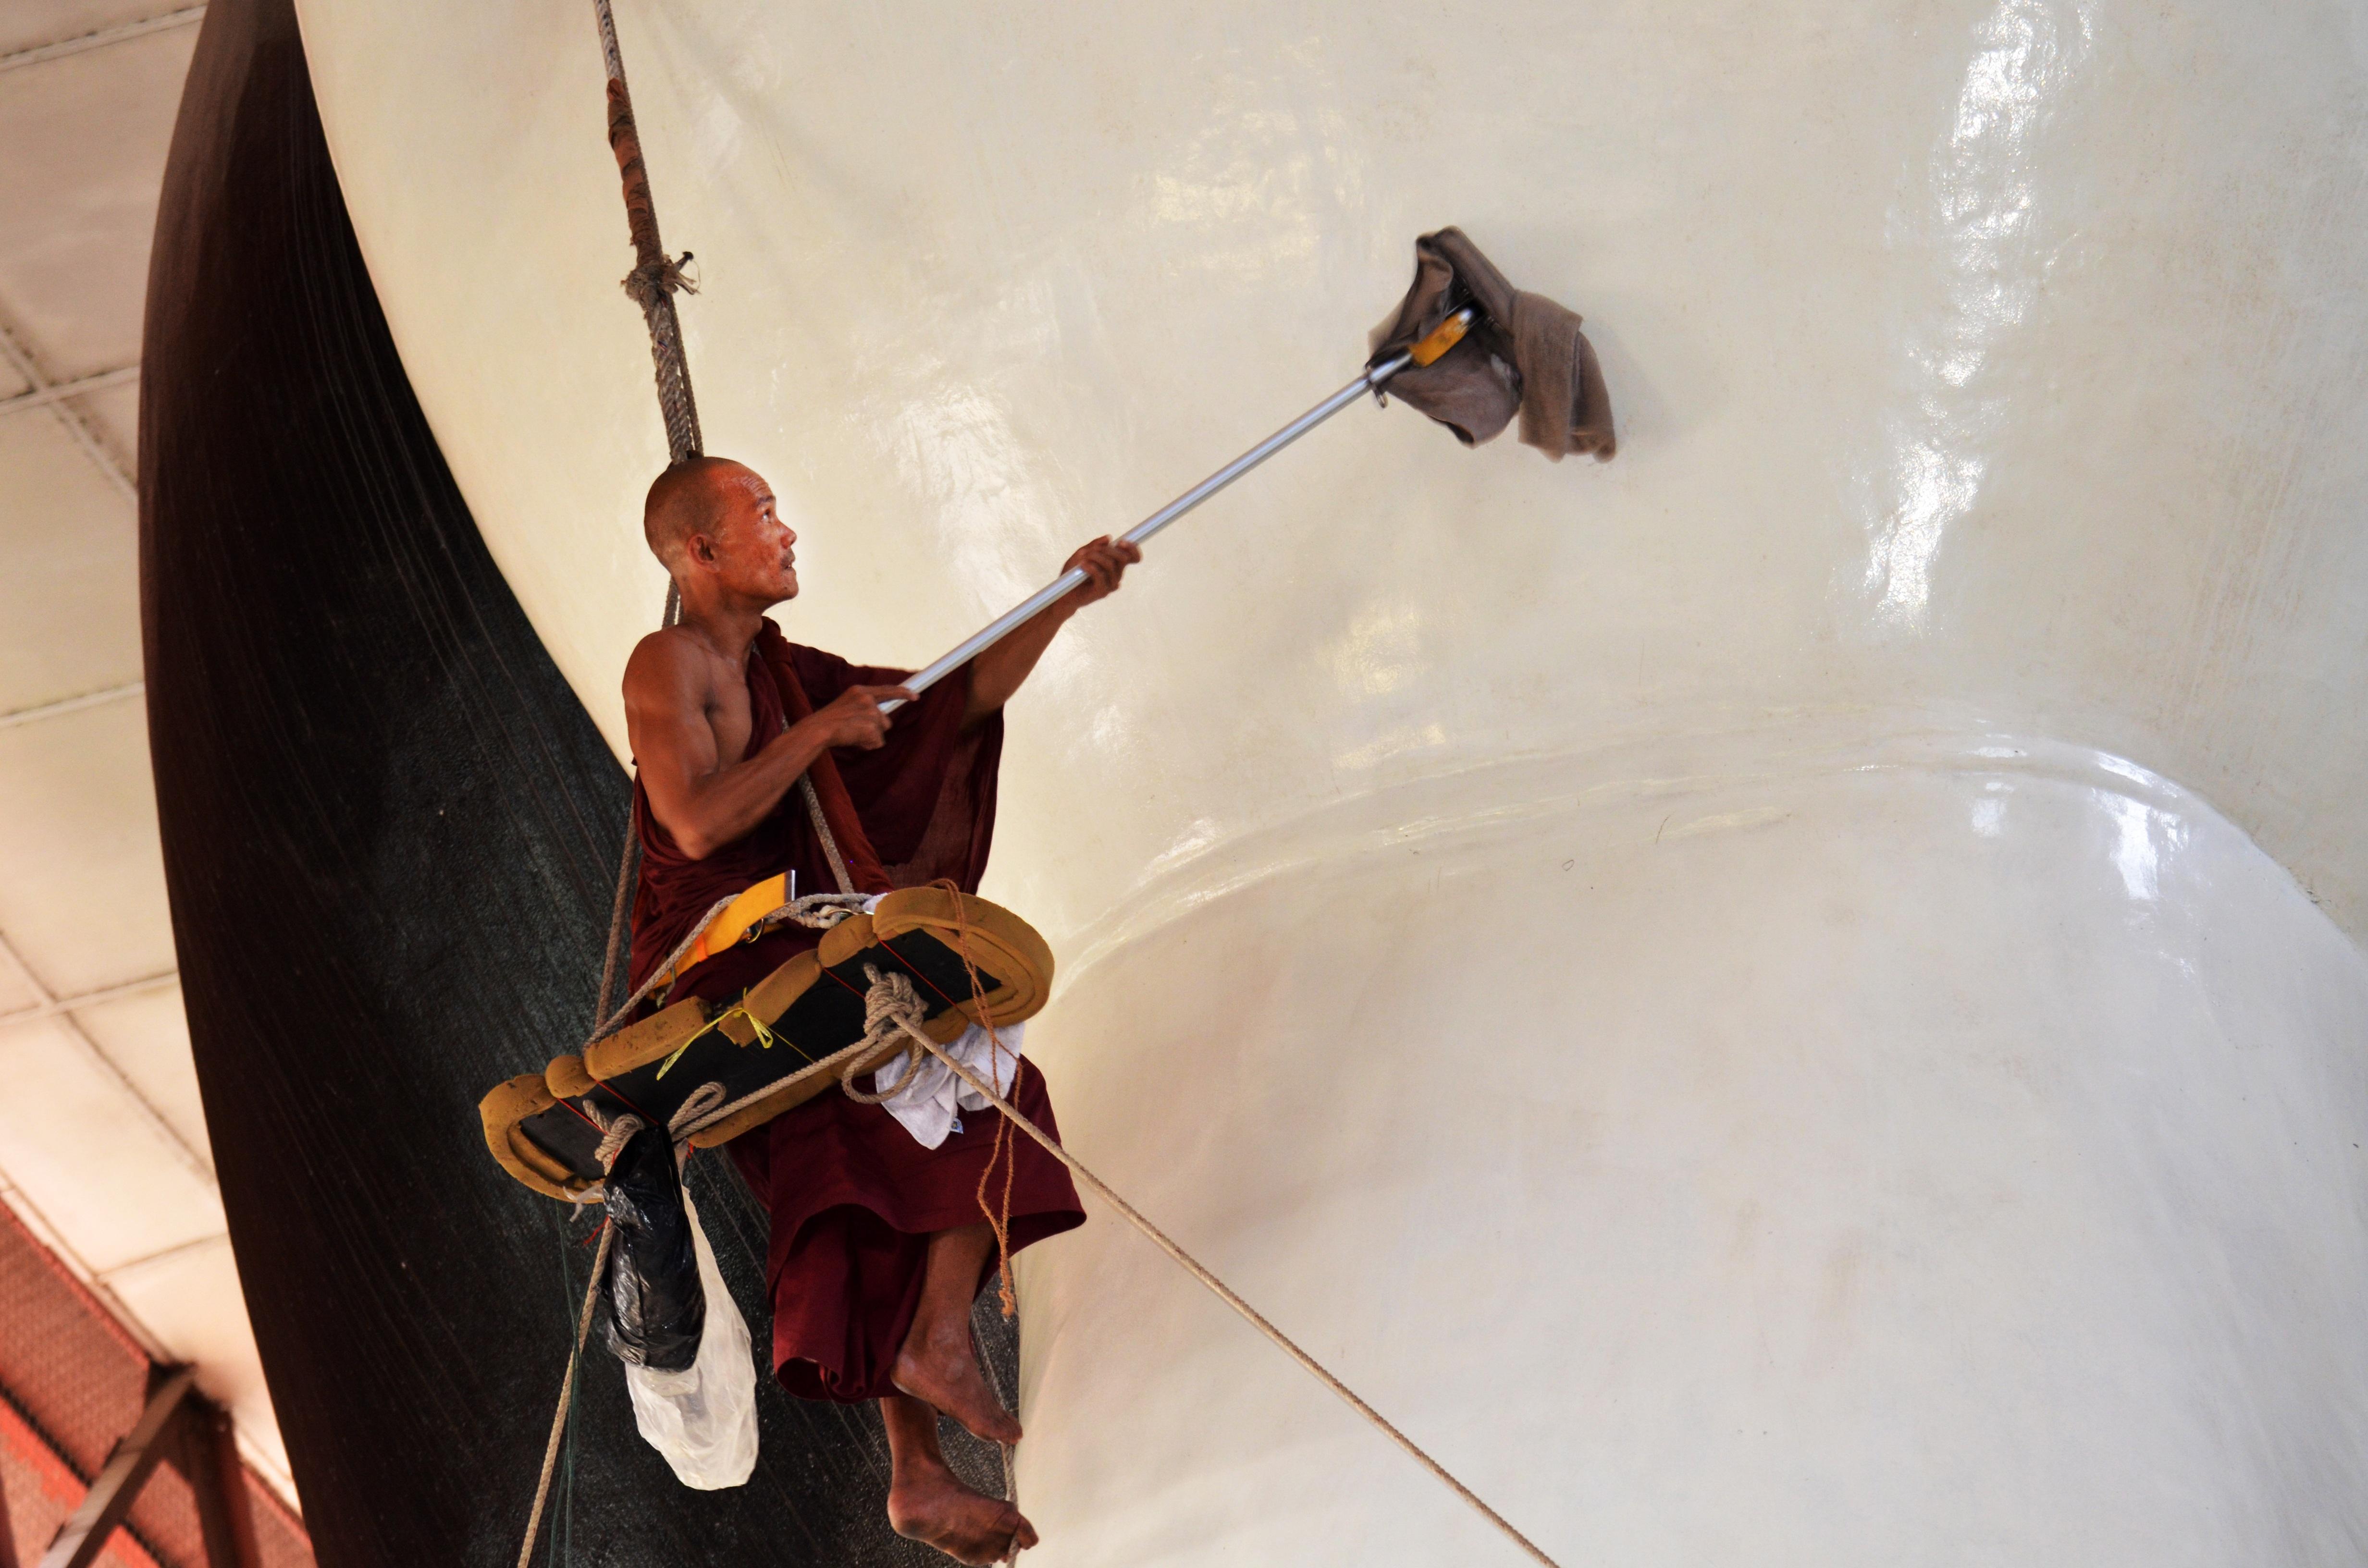 Gambar Gitar Pembersih Alat Musik Budha Selo Buddha Cleaner